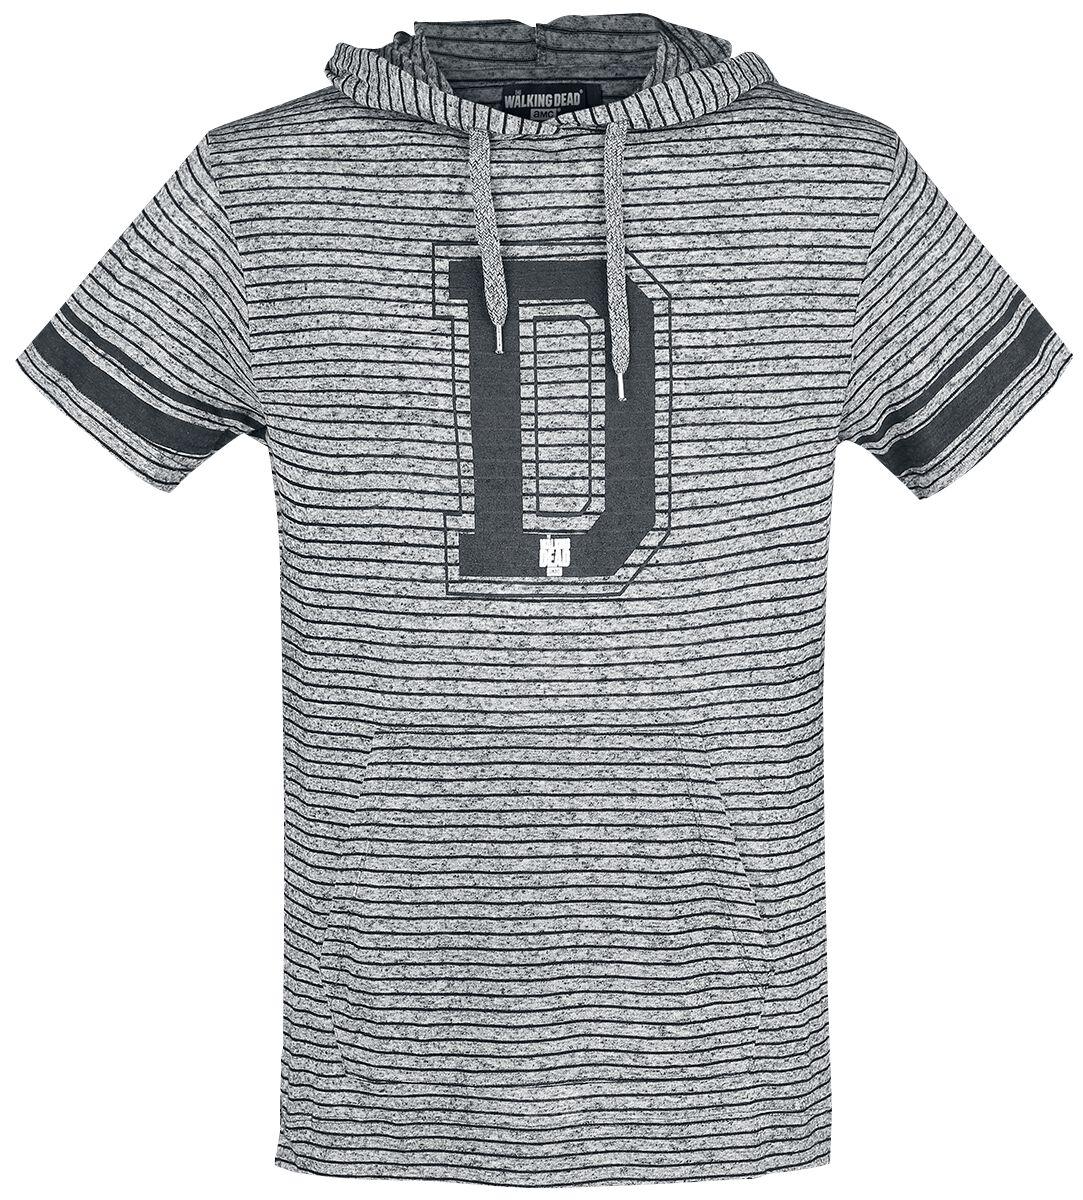 Image of   The Walking Dead Daryl Dixon T-Shirt blandet grå-sort